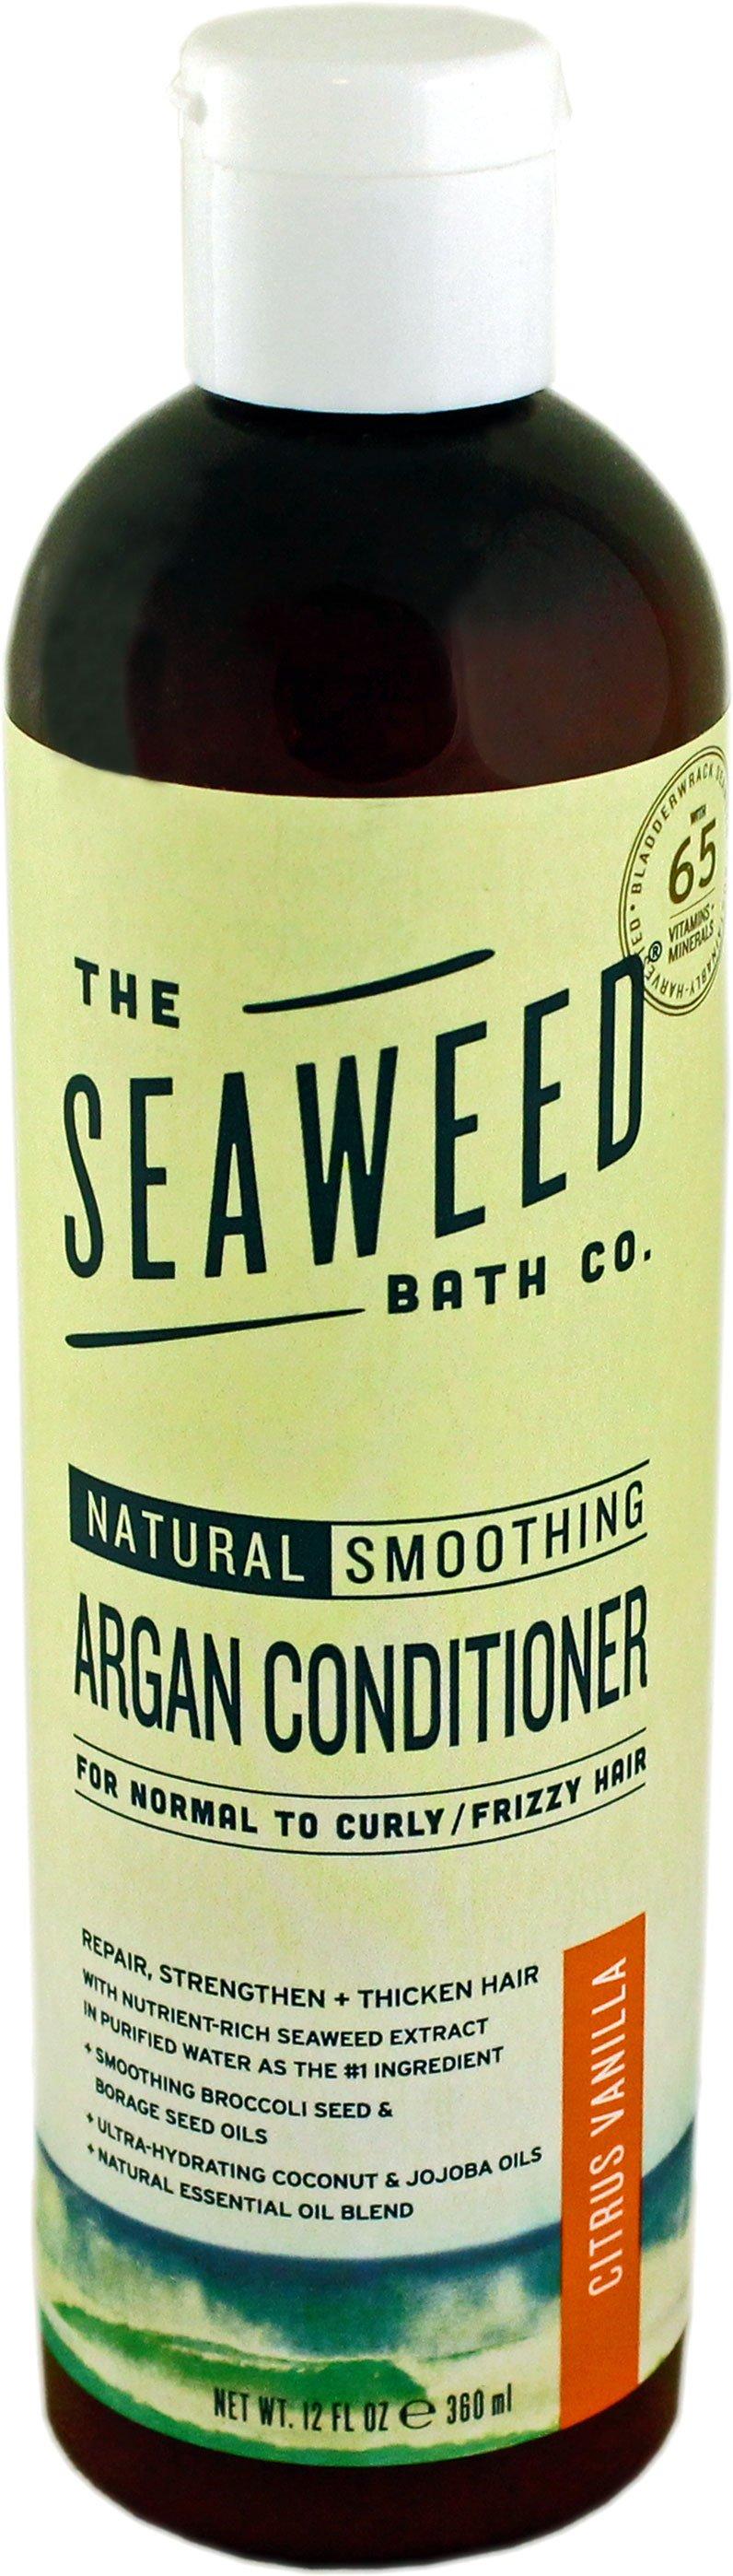 The Seaweed Bath Co Conditioner Natural Argan Citrus Shop Shampoo Conditioner At H E B